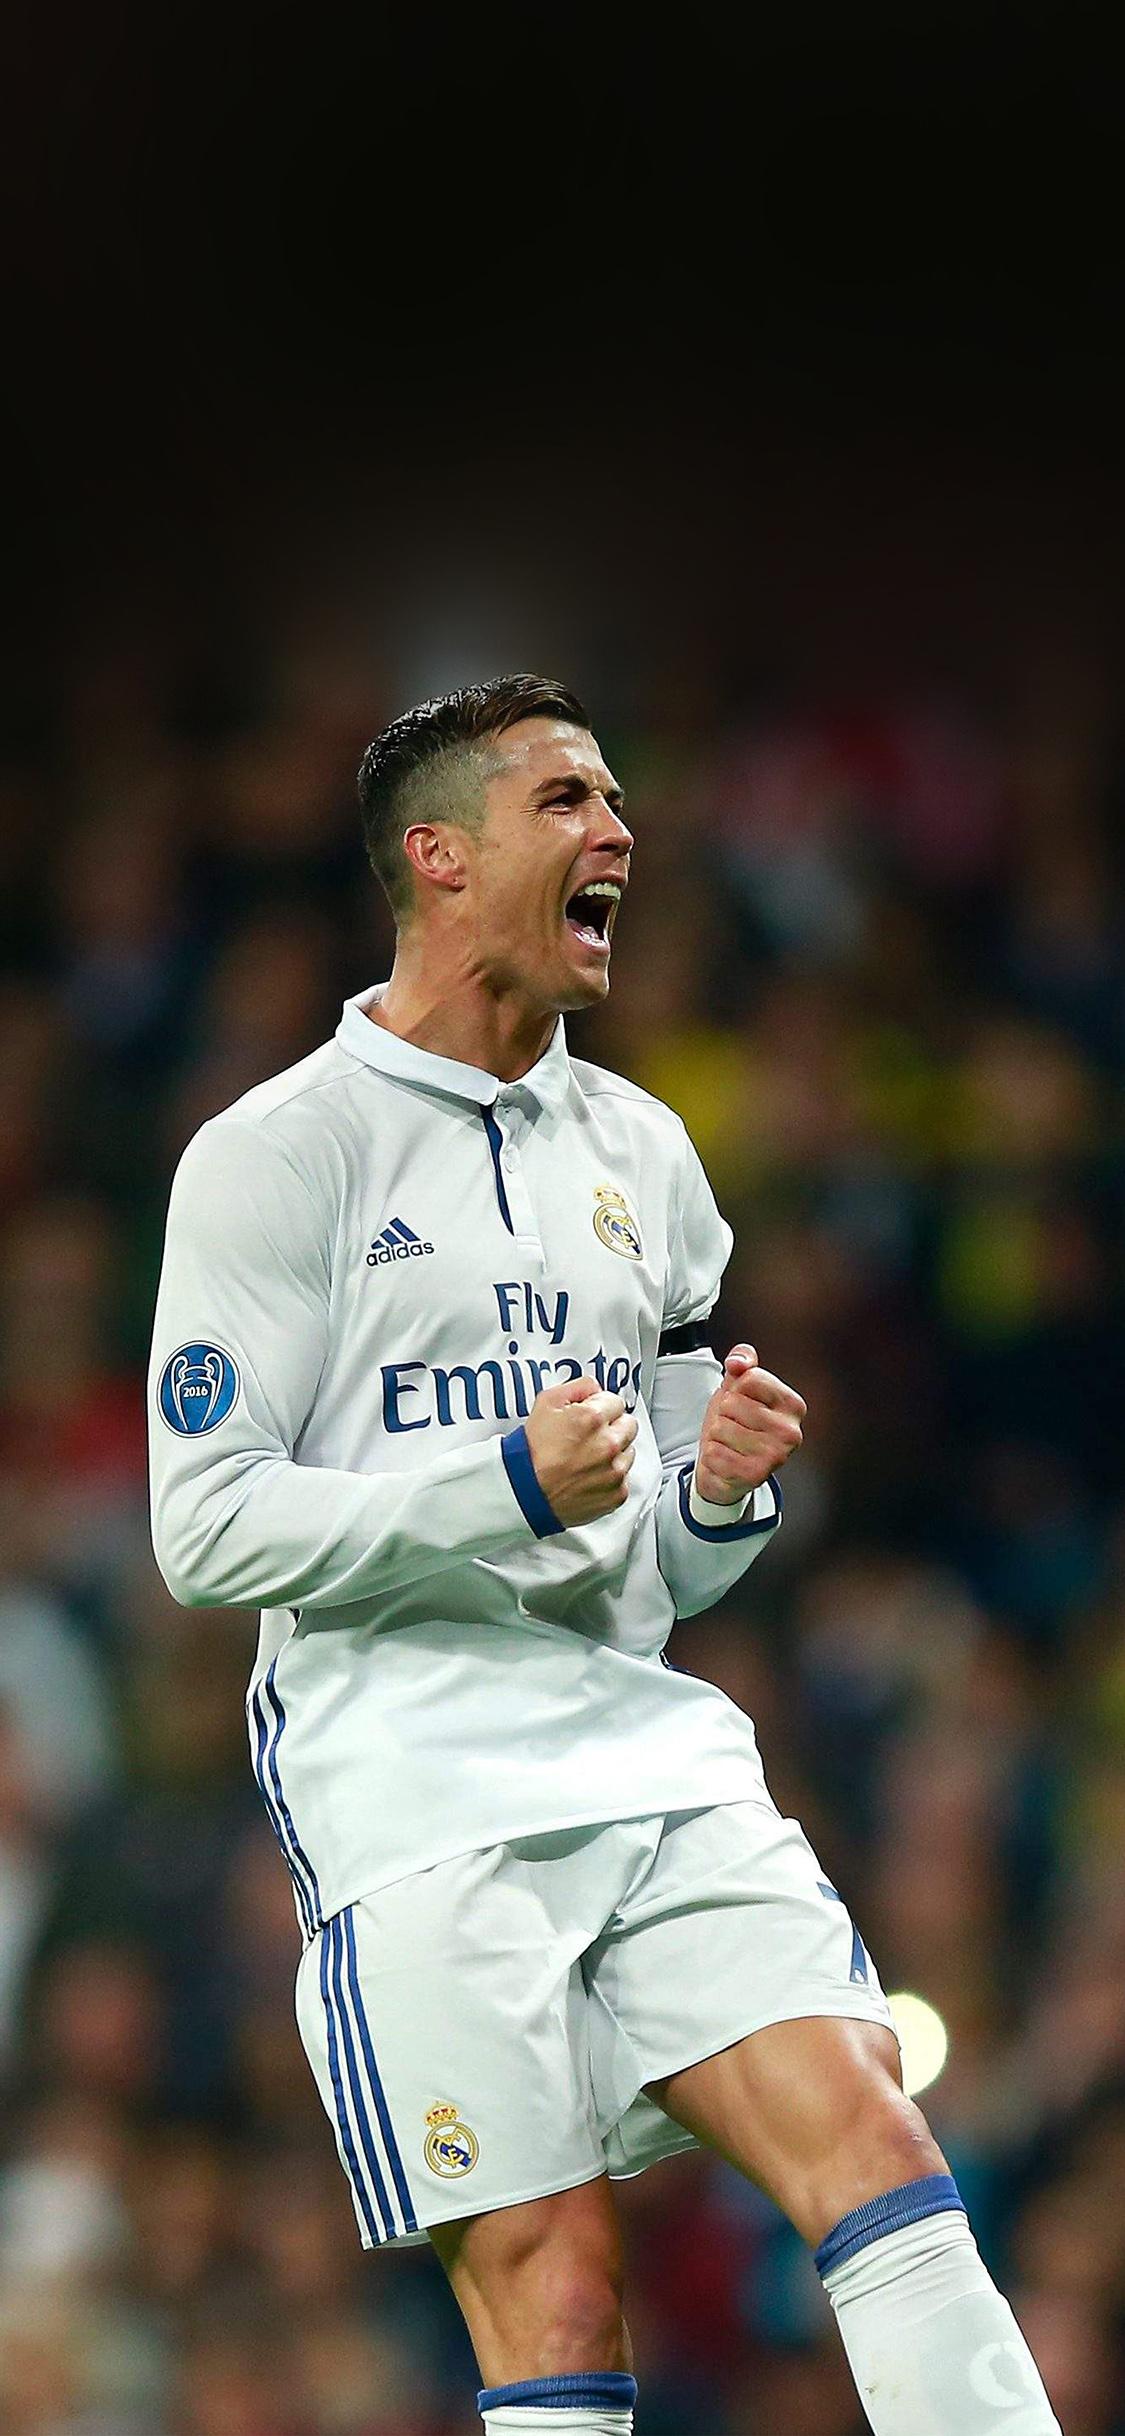 Real Madrid Iphone 4 Wallpaper Hm22 C Ronaldo Soccer Real Madrid Sports Wallpaper